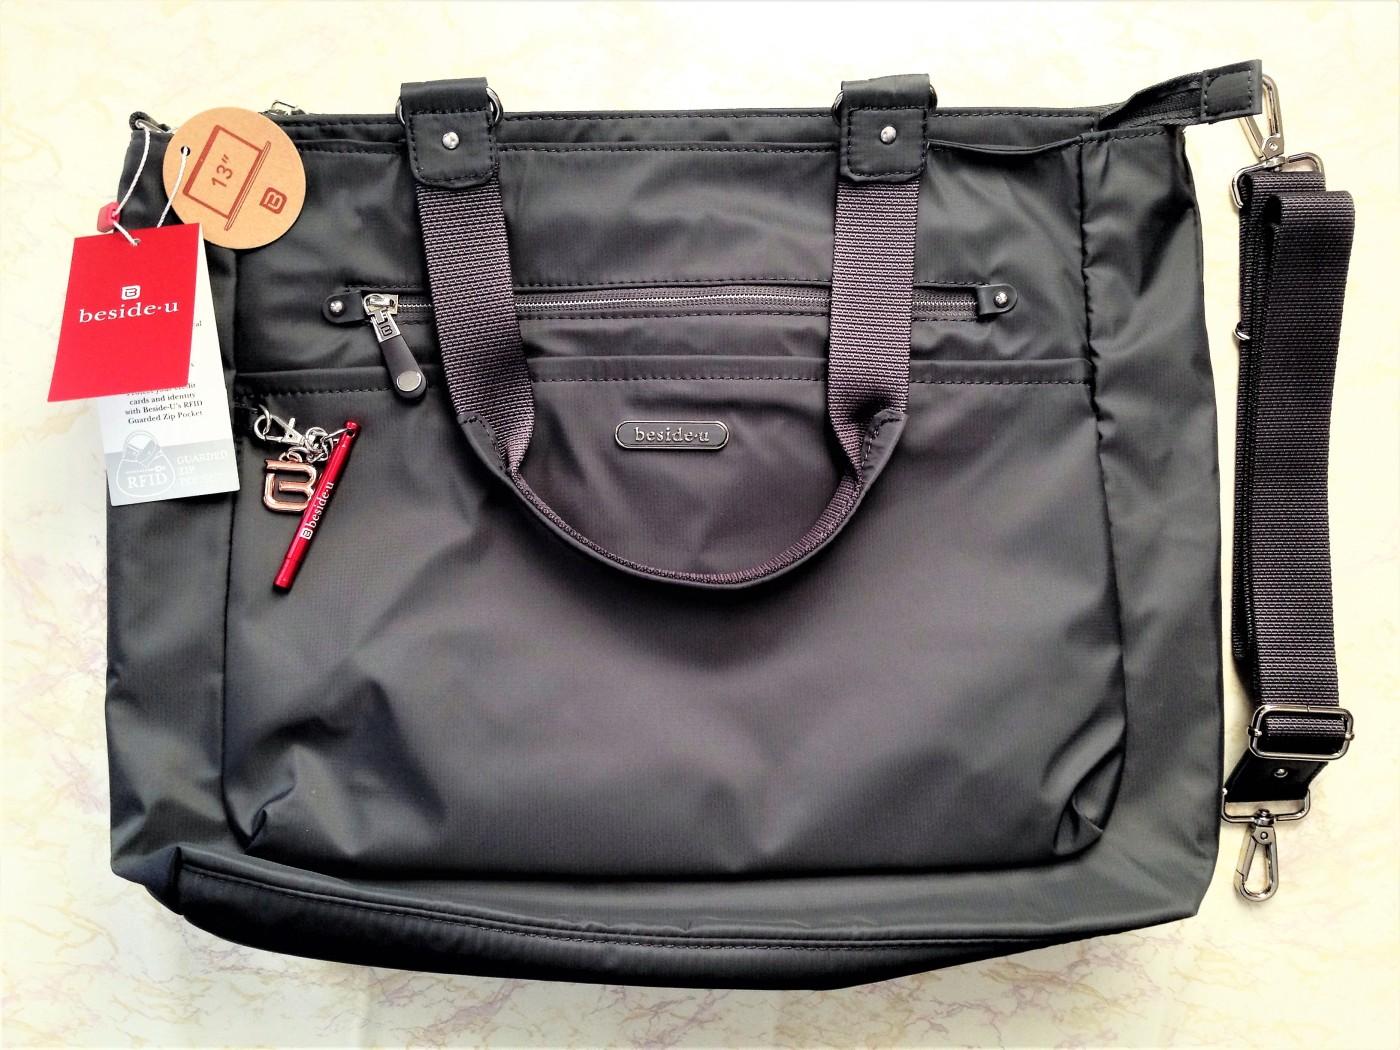 Beside U Nutopia Leather Fontana tote bag review